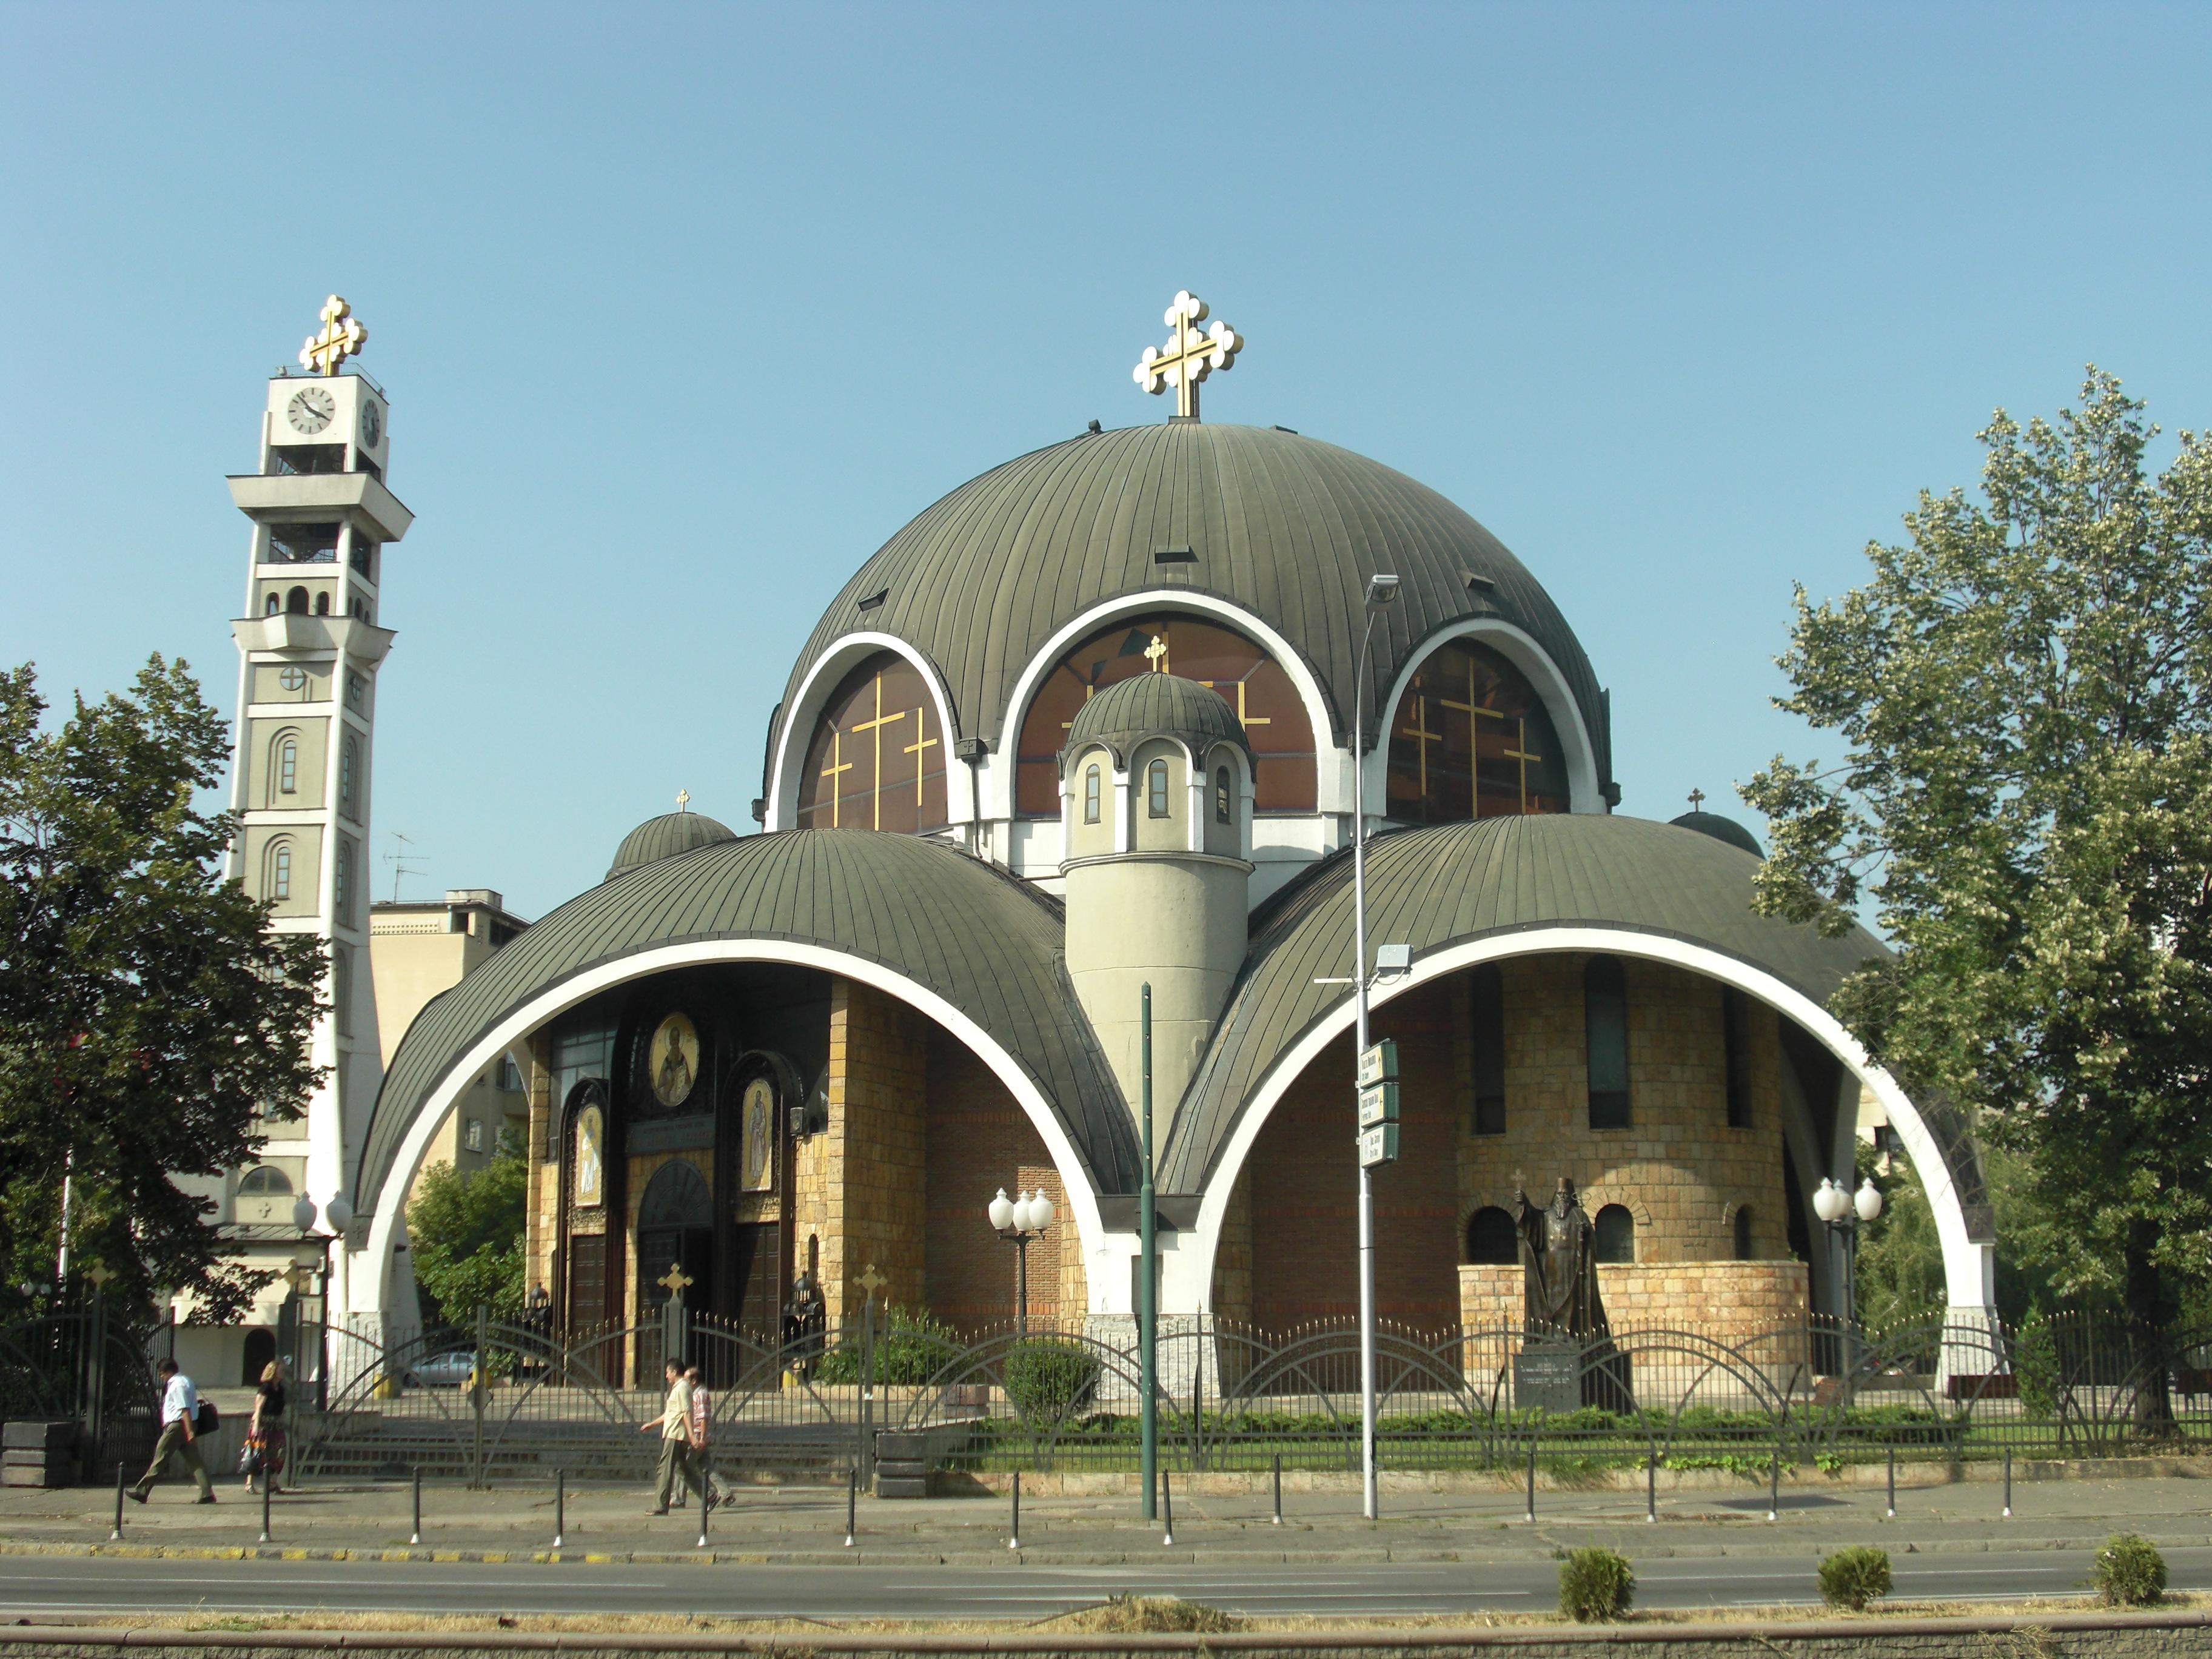 Mazedonisch Orthodoxe Kirche Македонска Православна Црква